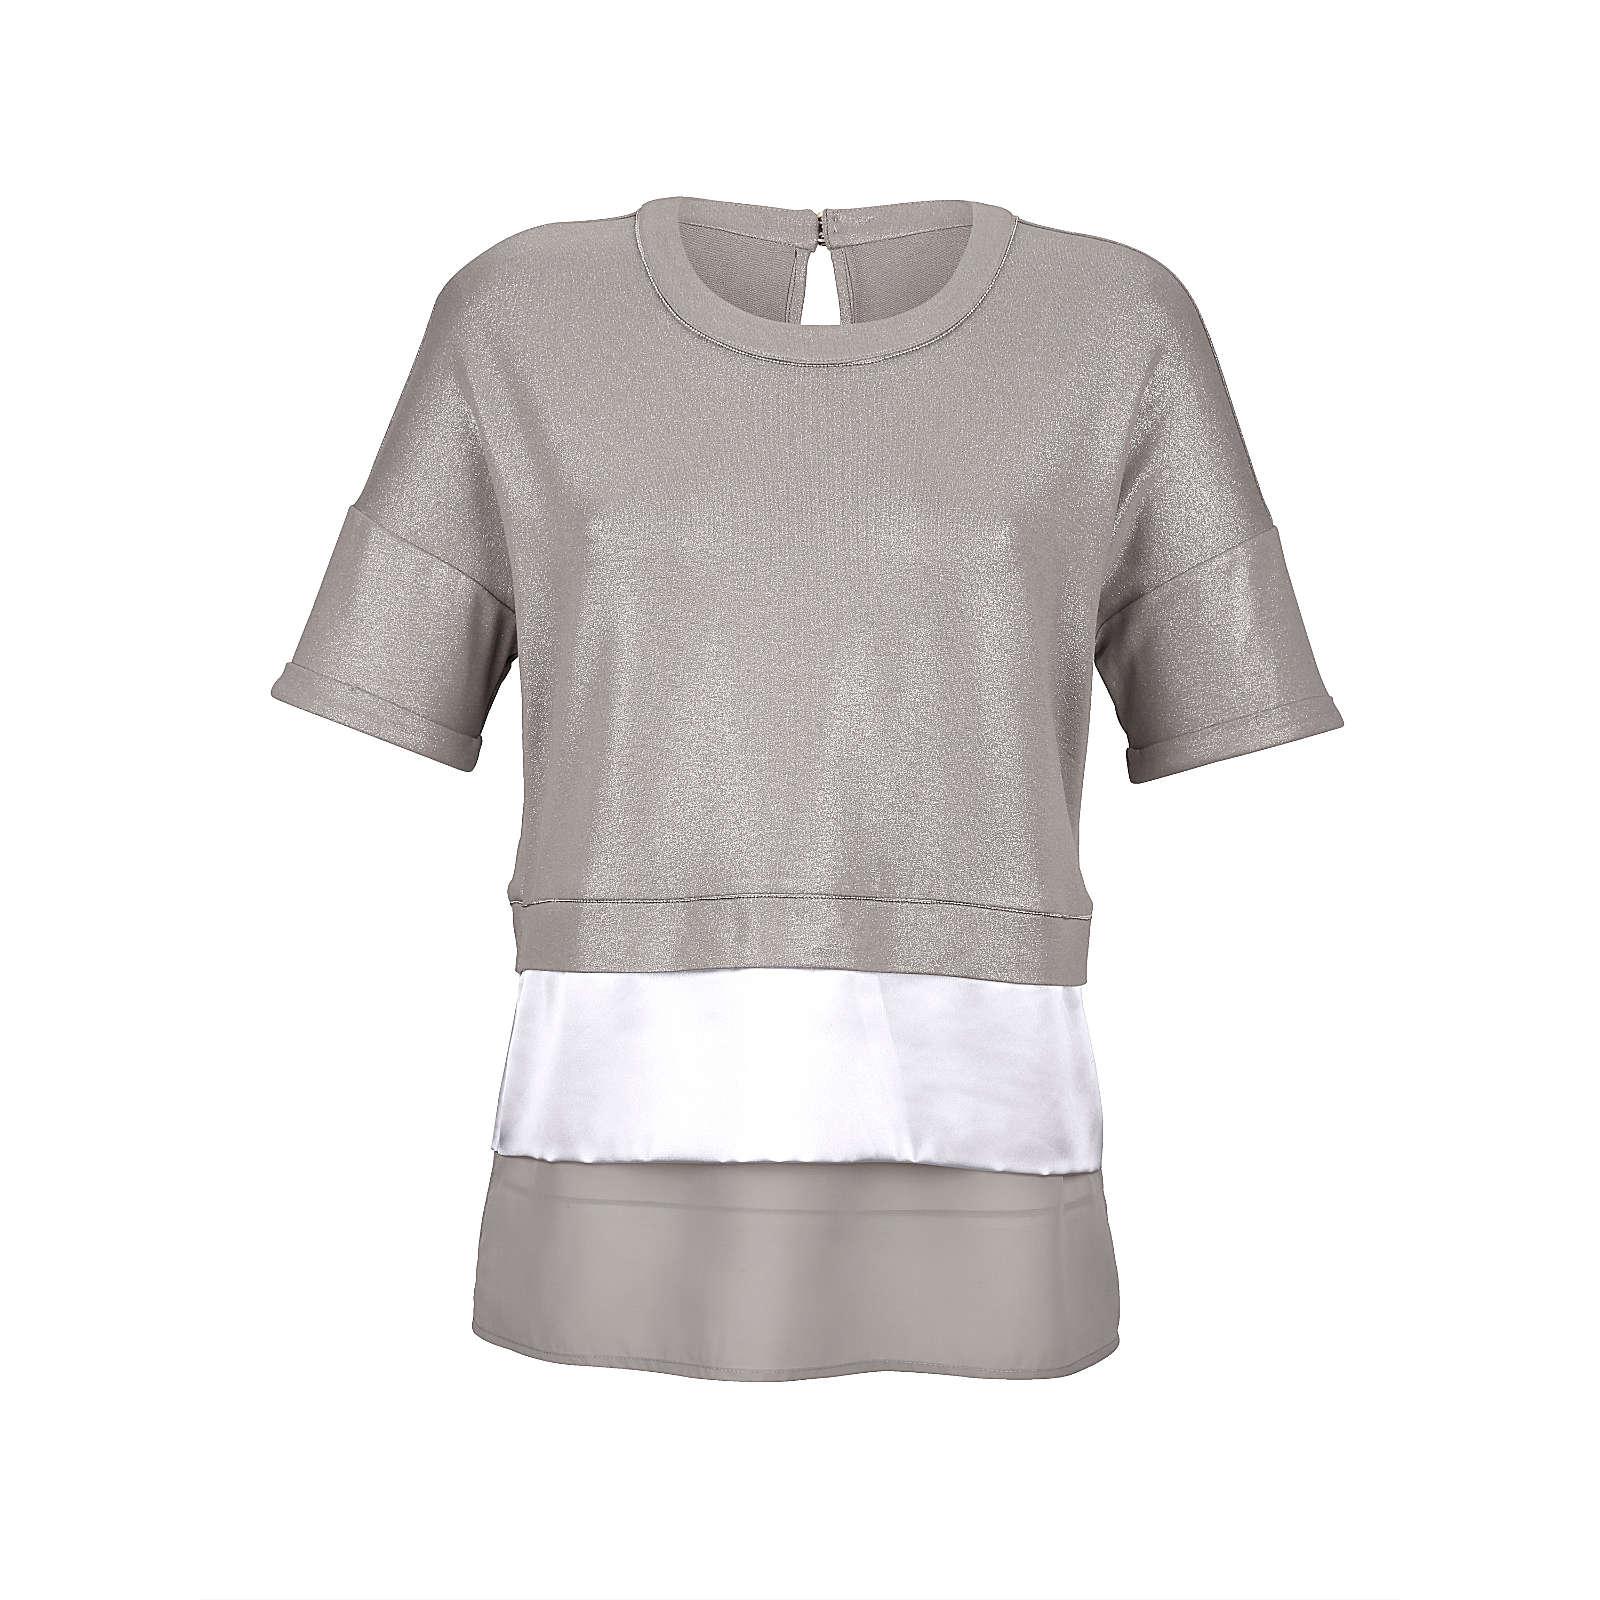 Alba Moda Shirt grau Damen Gr. 36